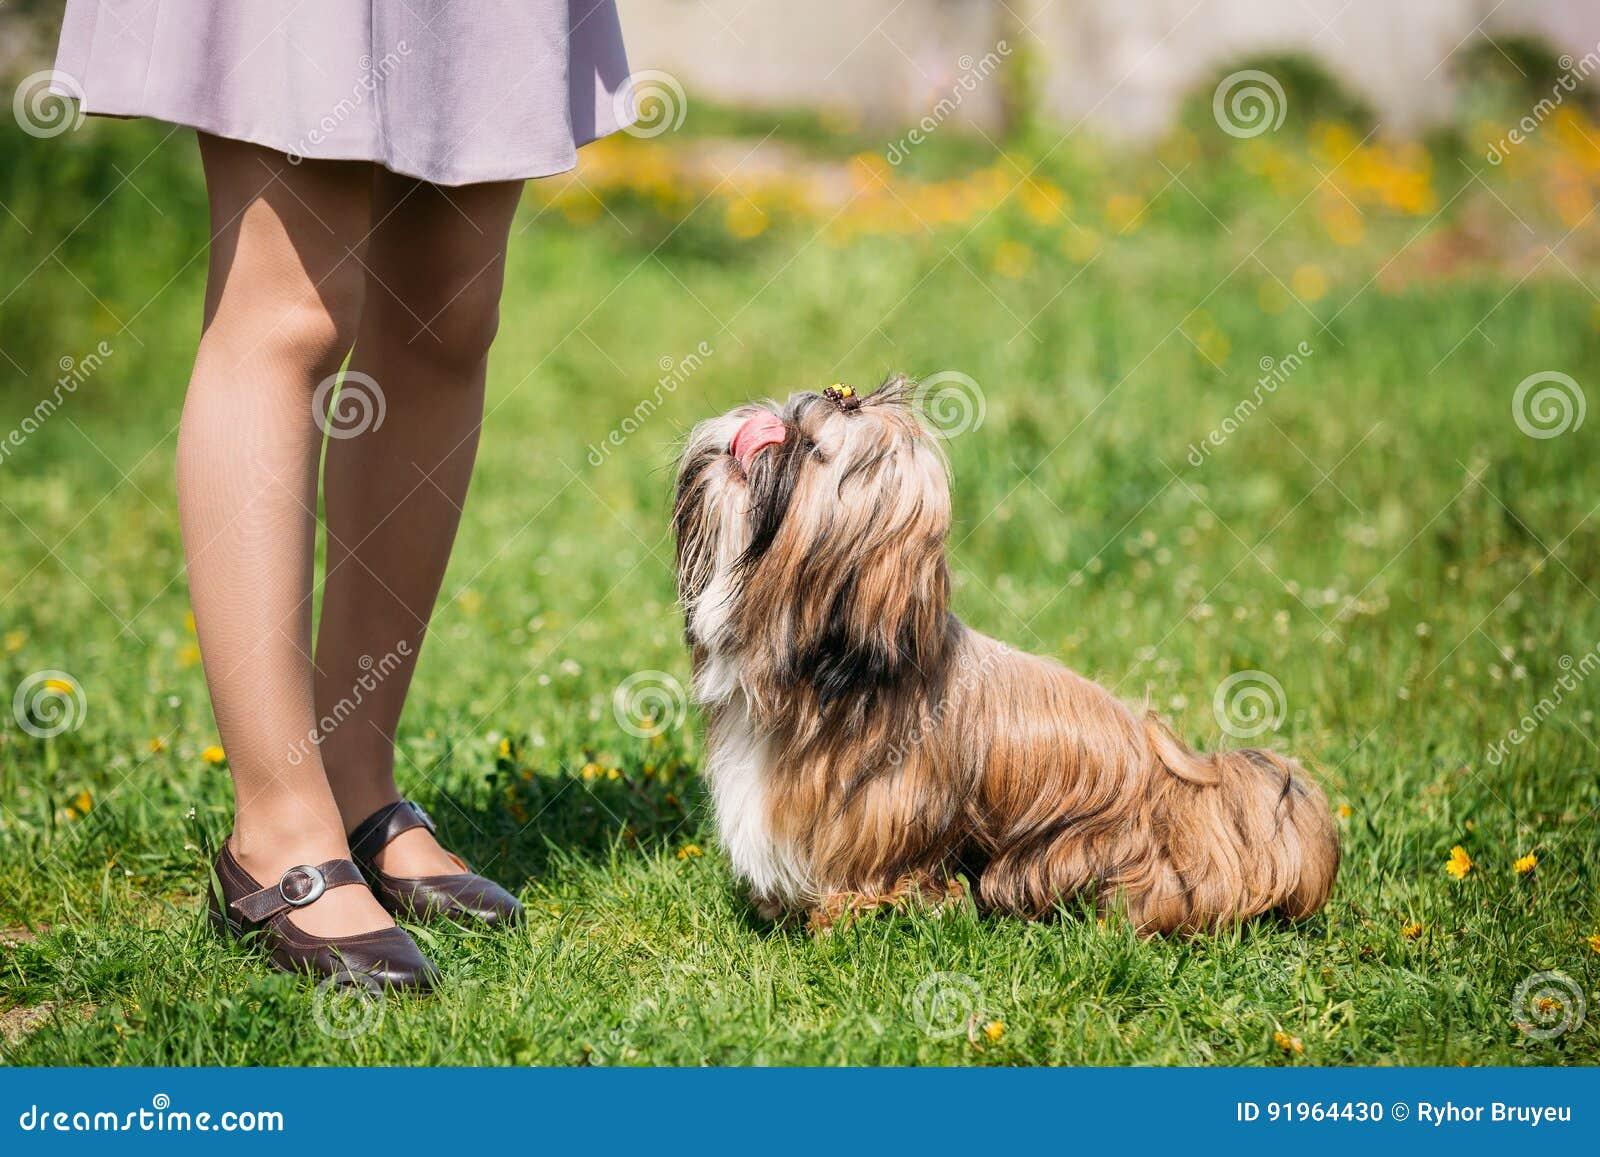 Cute Shih Tzu Toy Dog Sit In Green Spring Meadow. Playful Pet